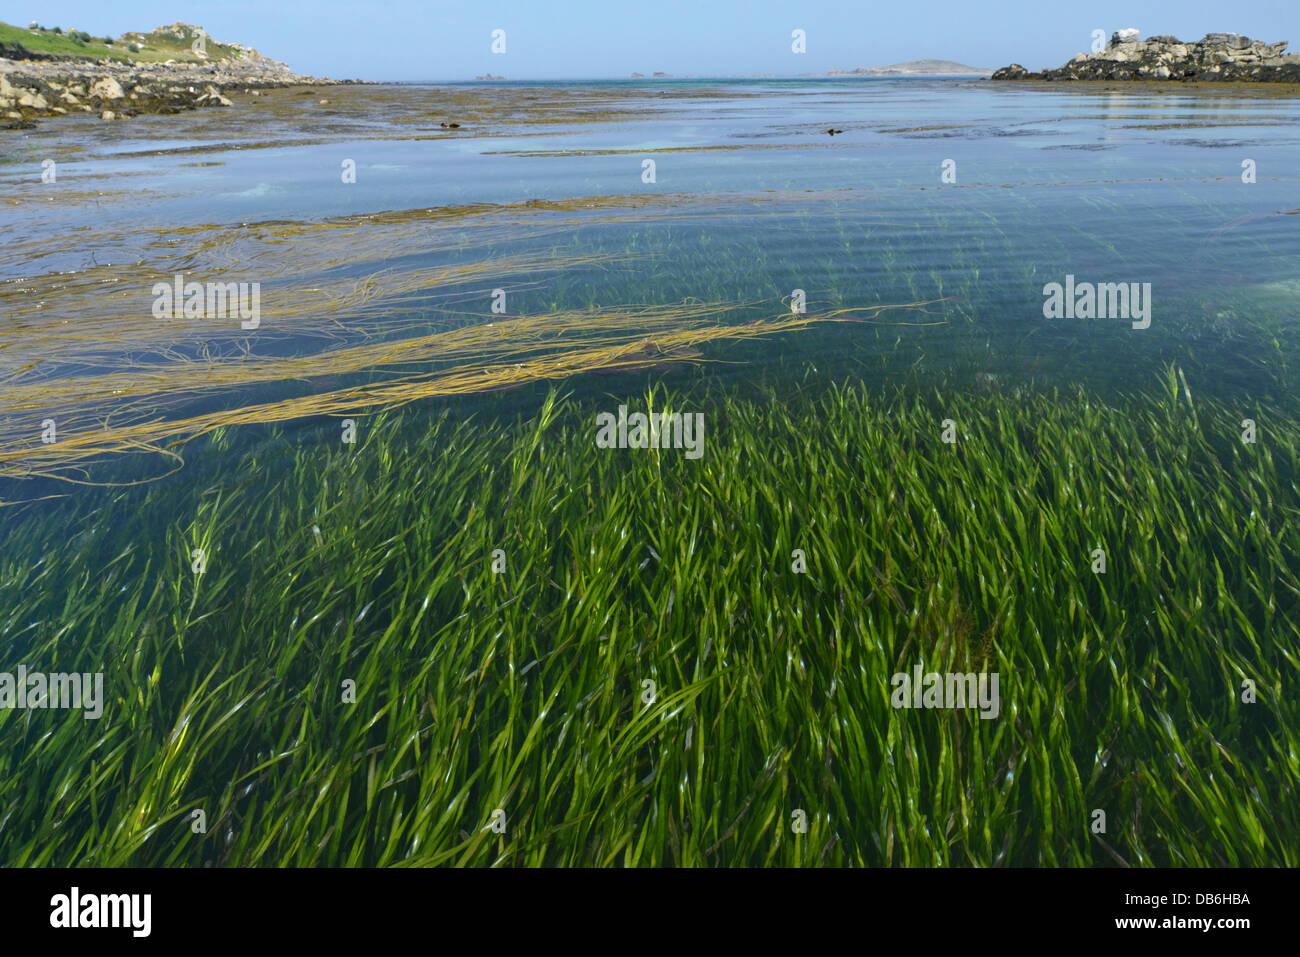 - La zostère Zostera marina. Zostères, au large de St Helen's, Îles Scilly. Photo Stock